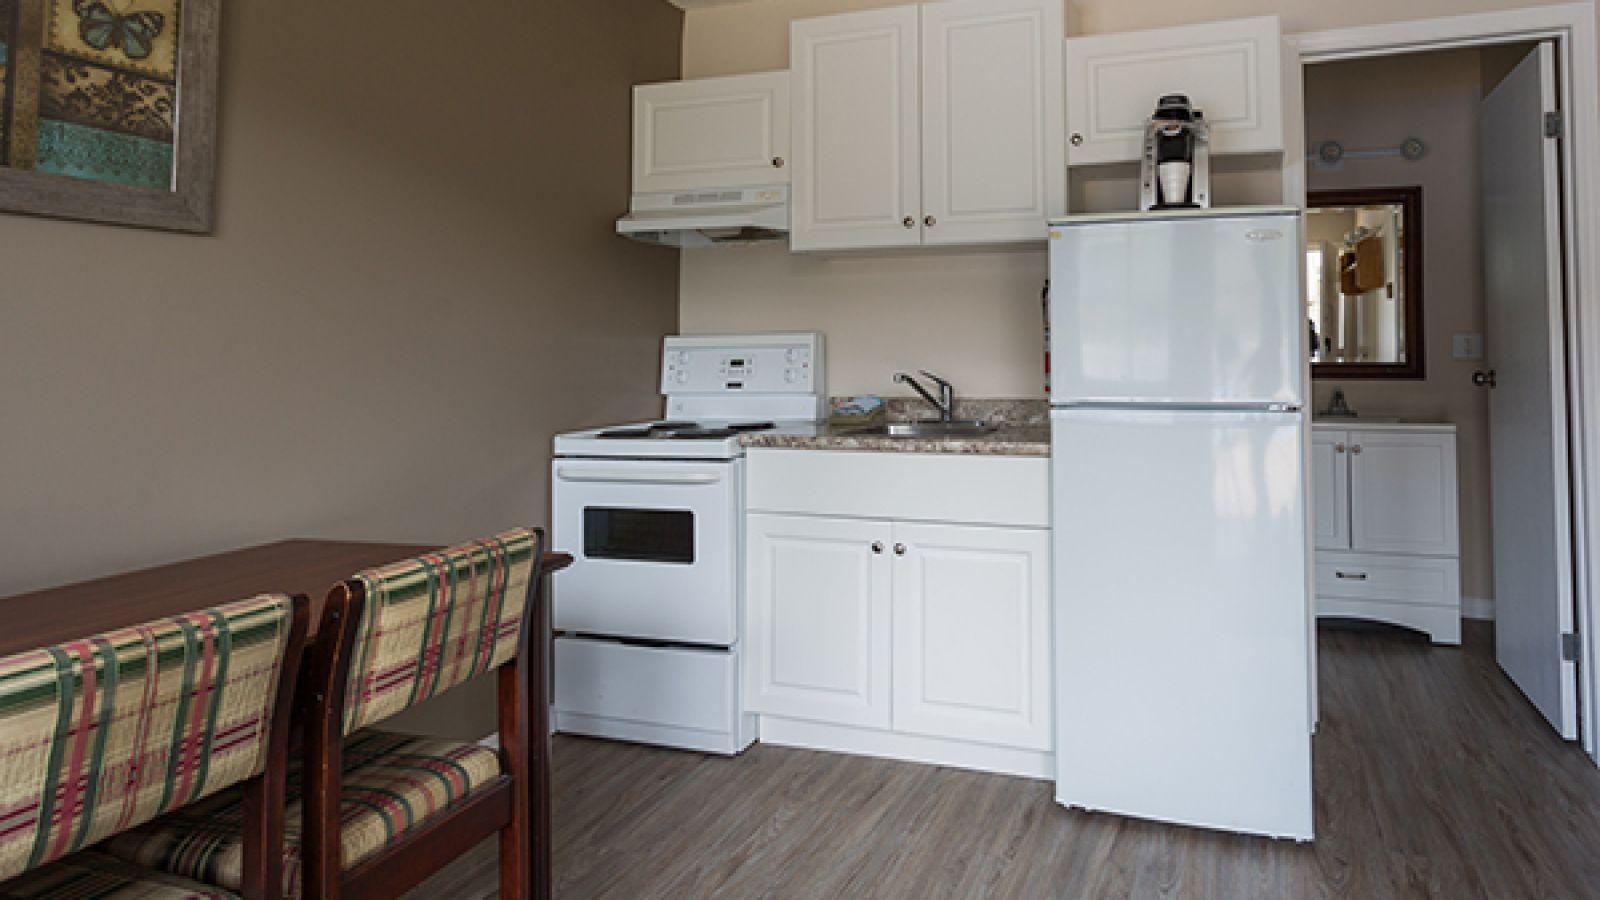 Kitchenette suites & apartments available.